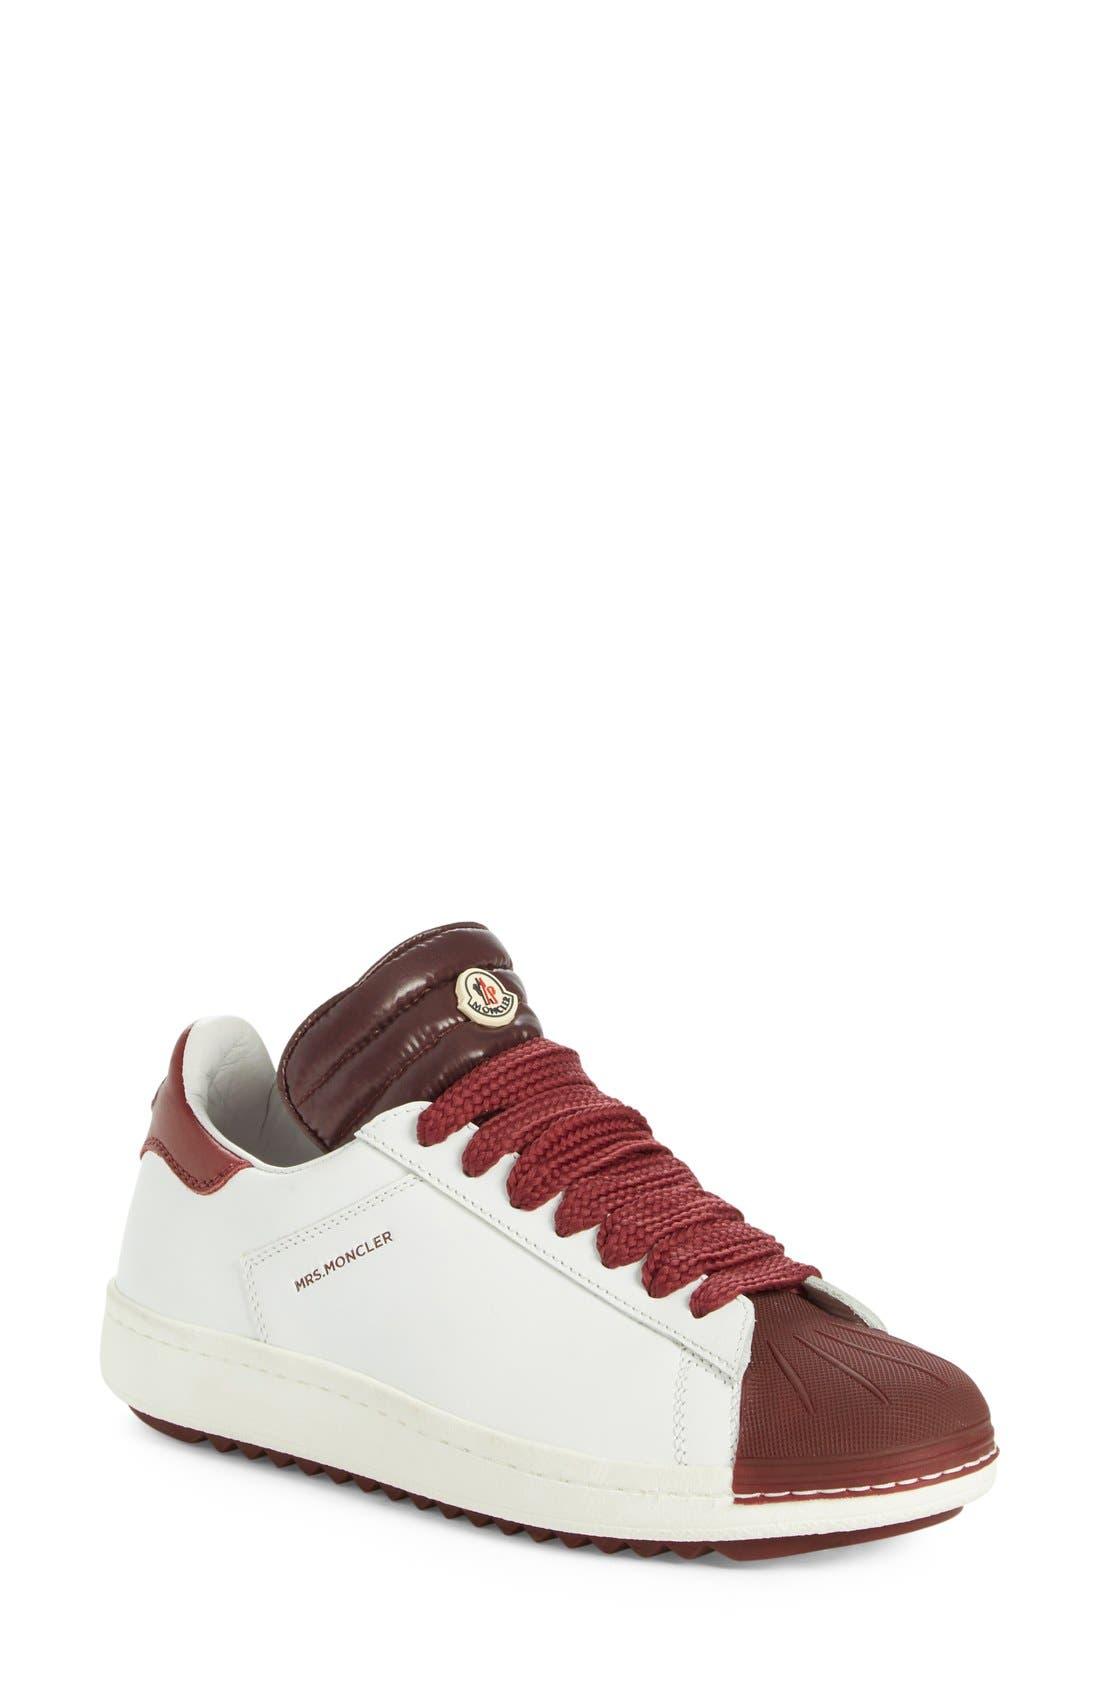 'Angeline Scarpa' Sneaker,                             Main thumbnail 1, color,                             Burgundy